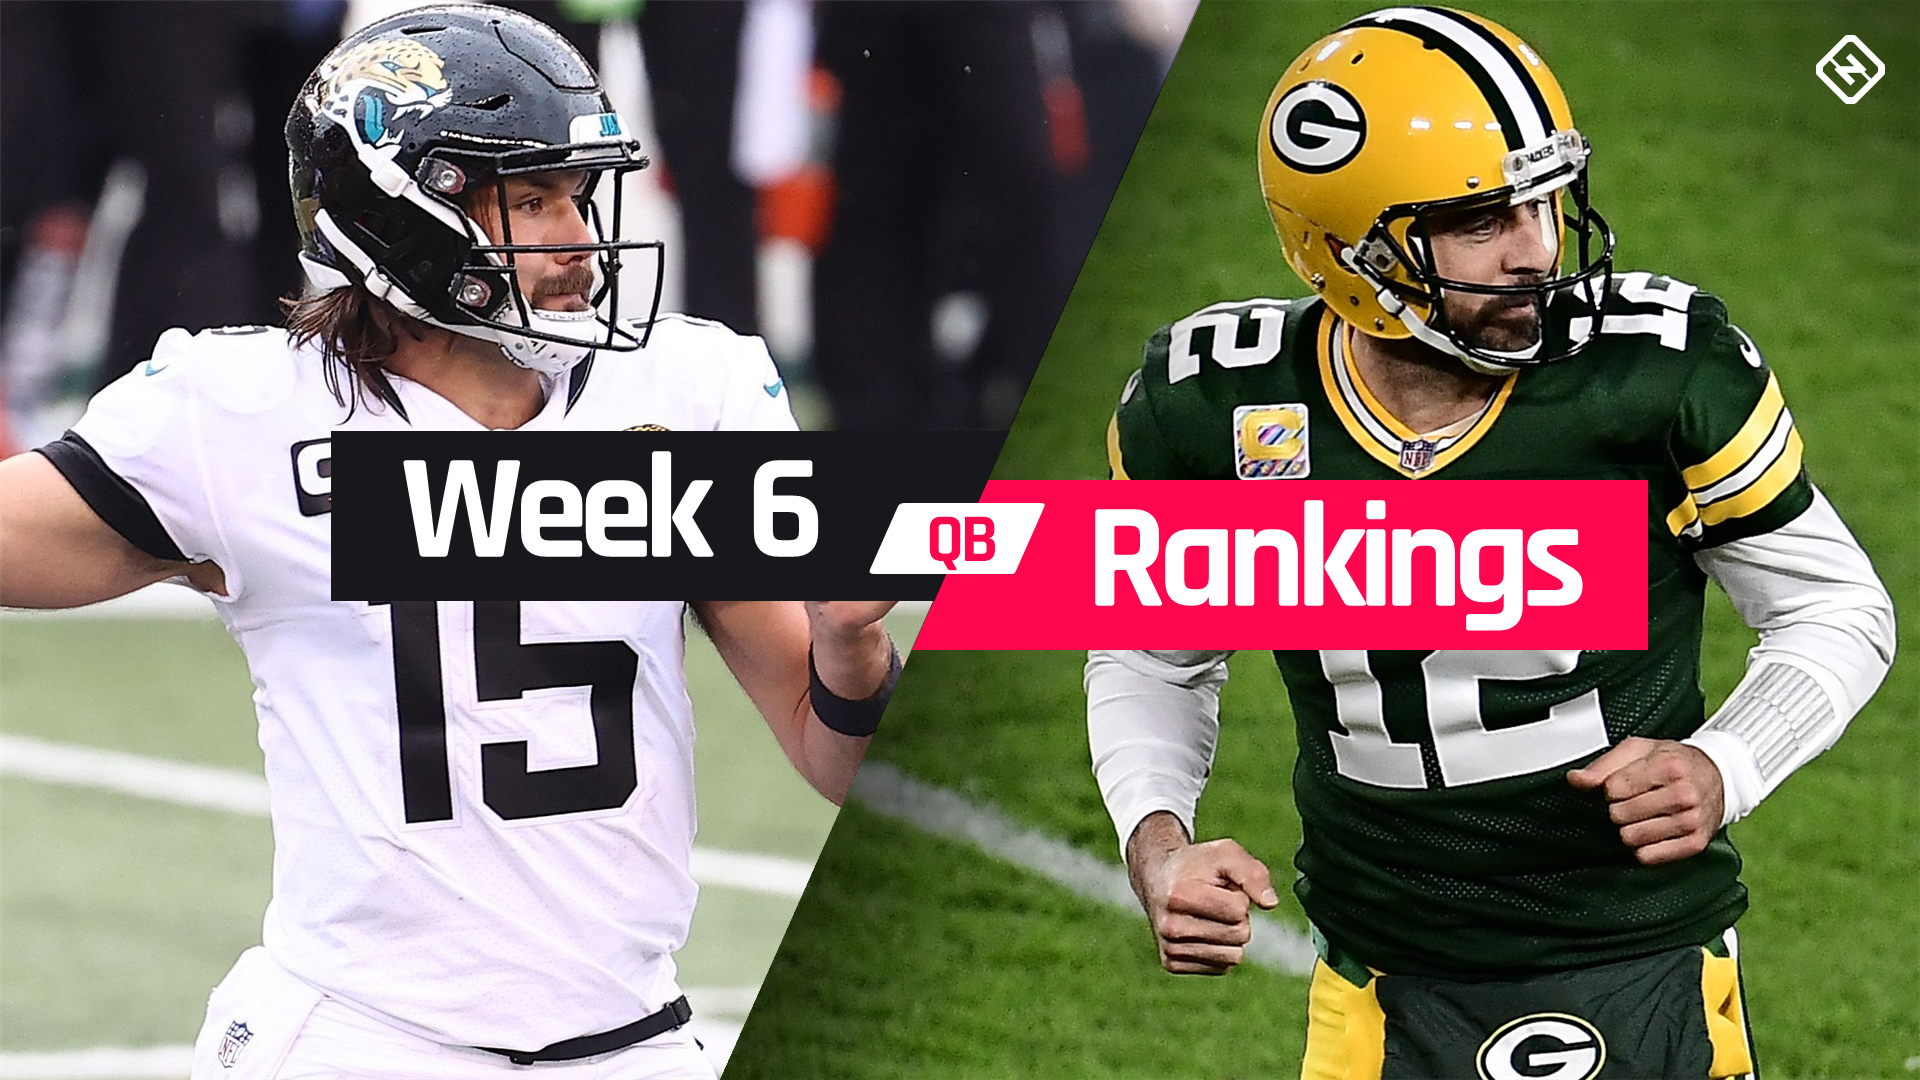 Week 6 Fantasy Football Quarterback Rankings